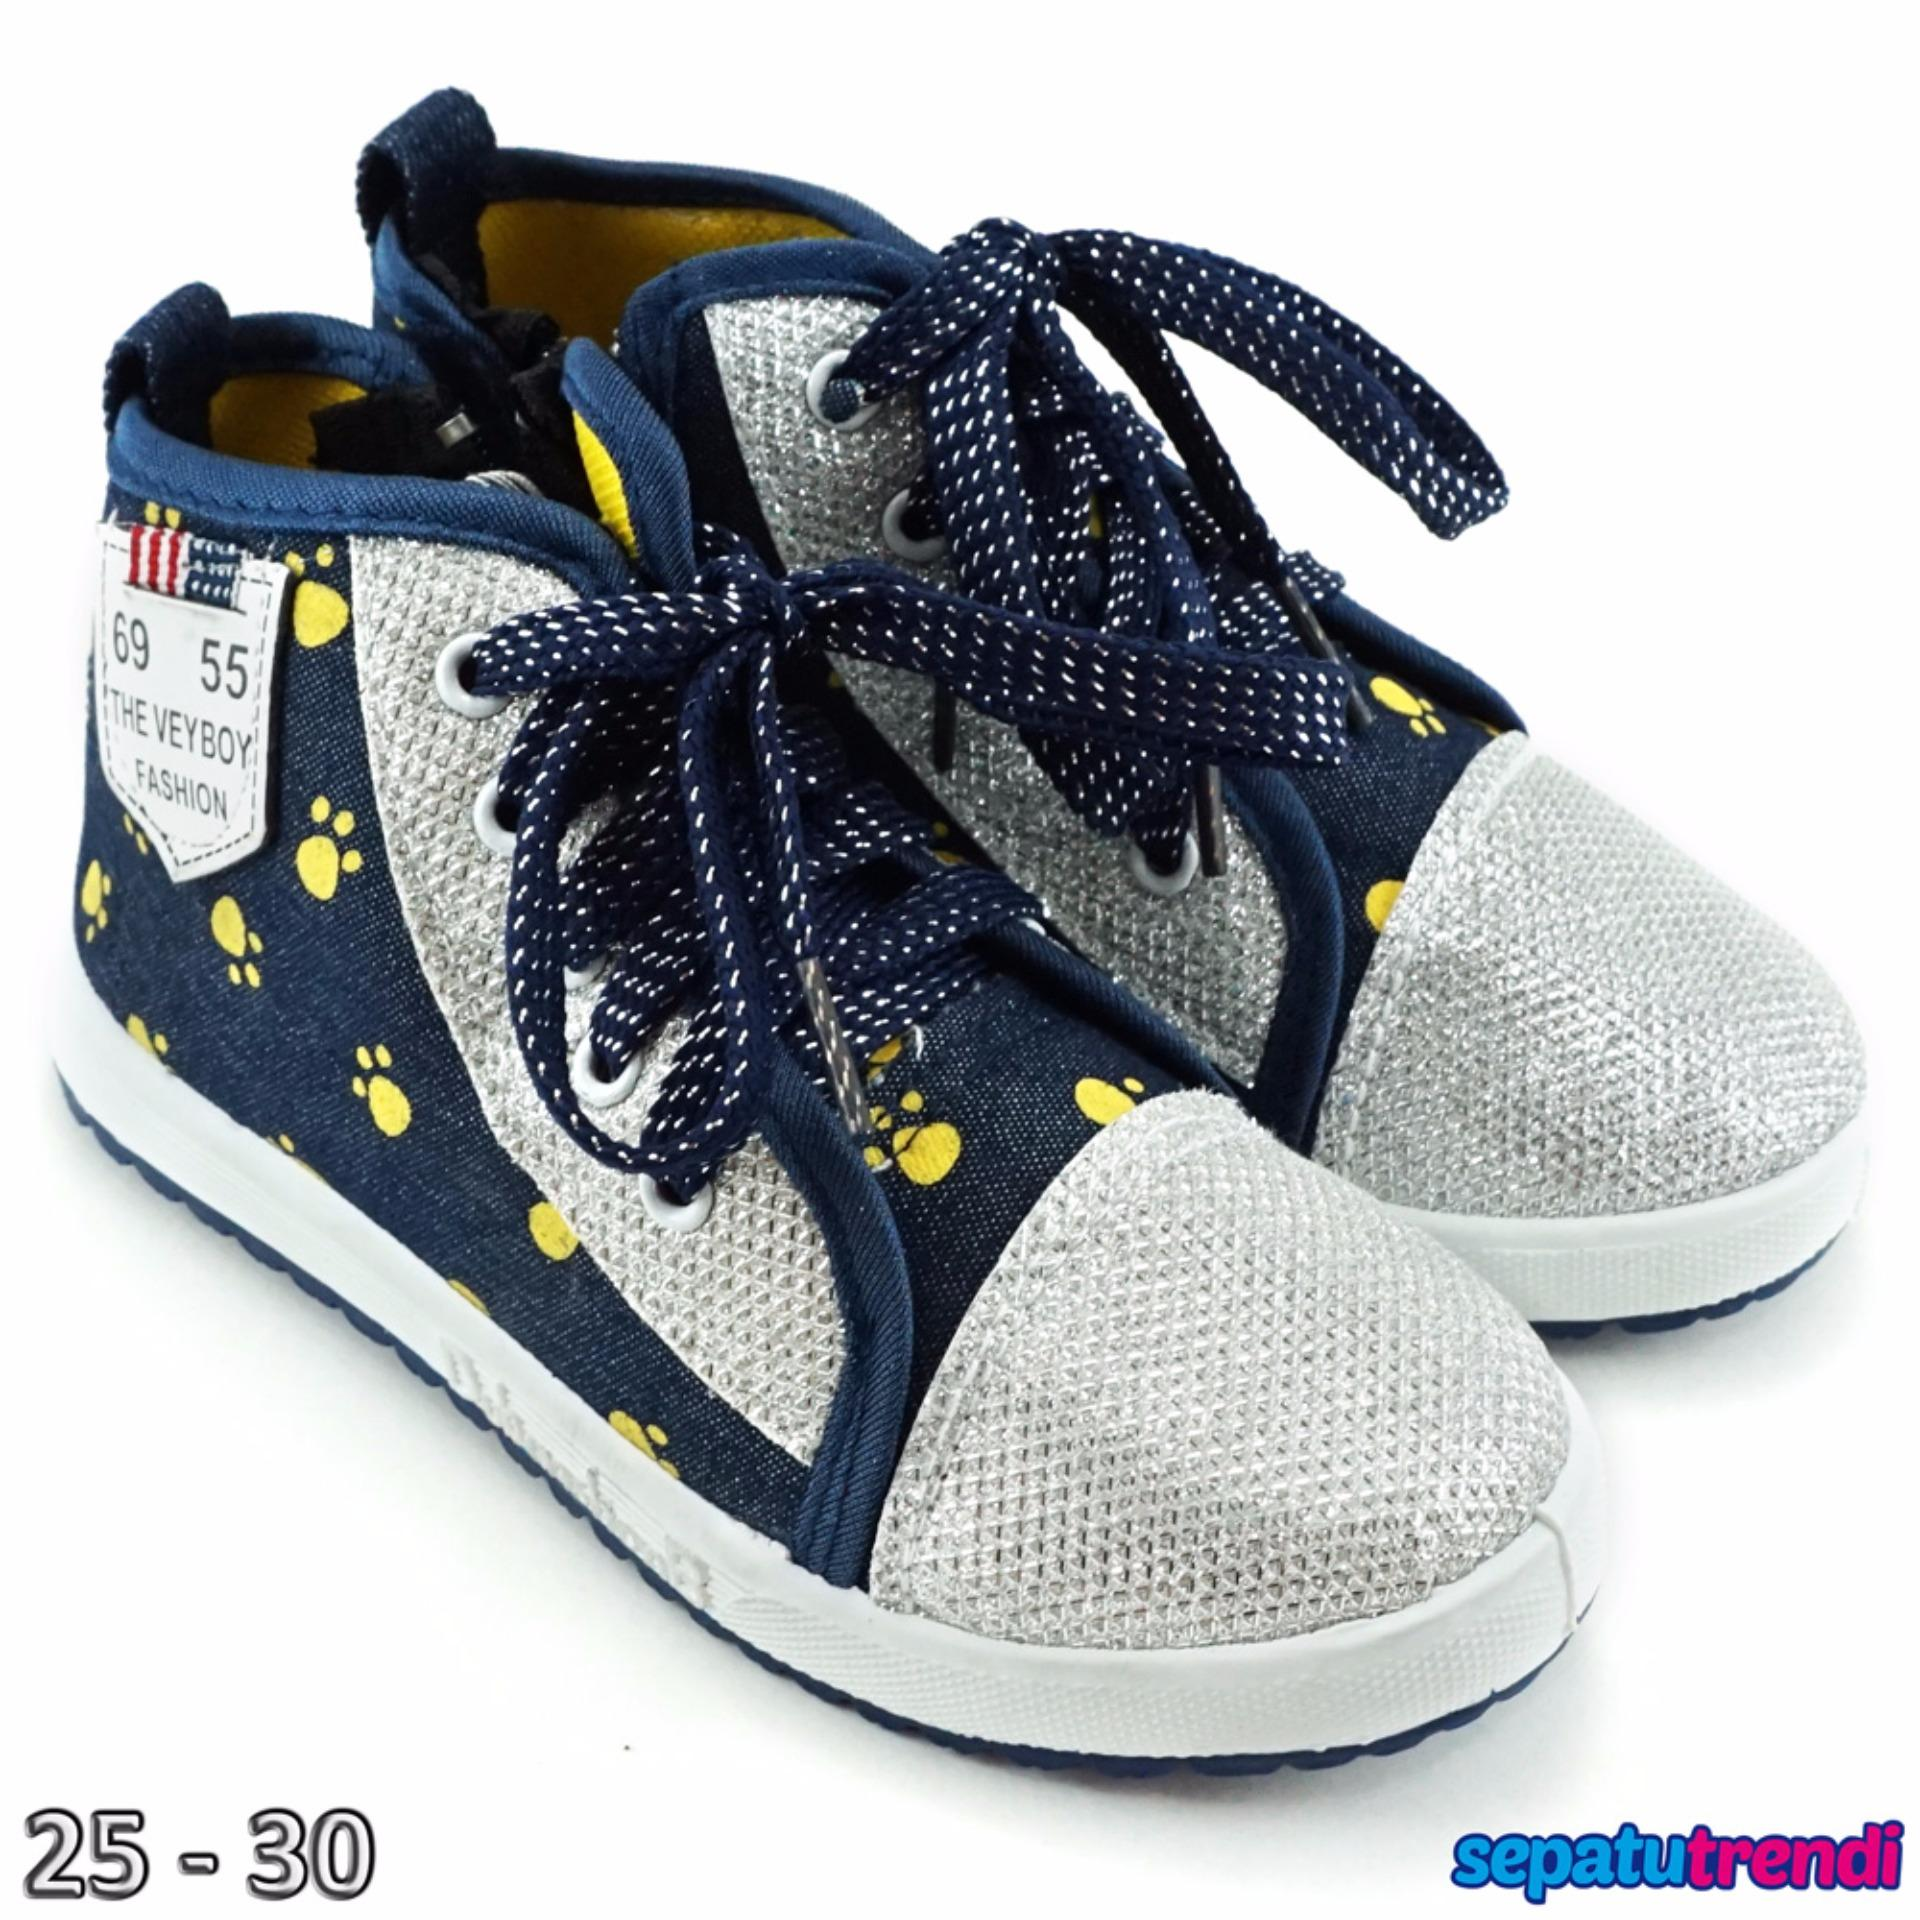 Trendishoes Sepatu Boot Anak Cewe Denim Import Zipper Veysnw Lis Navy Trendishoes Diskon 30